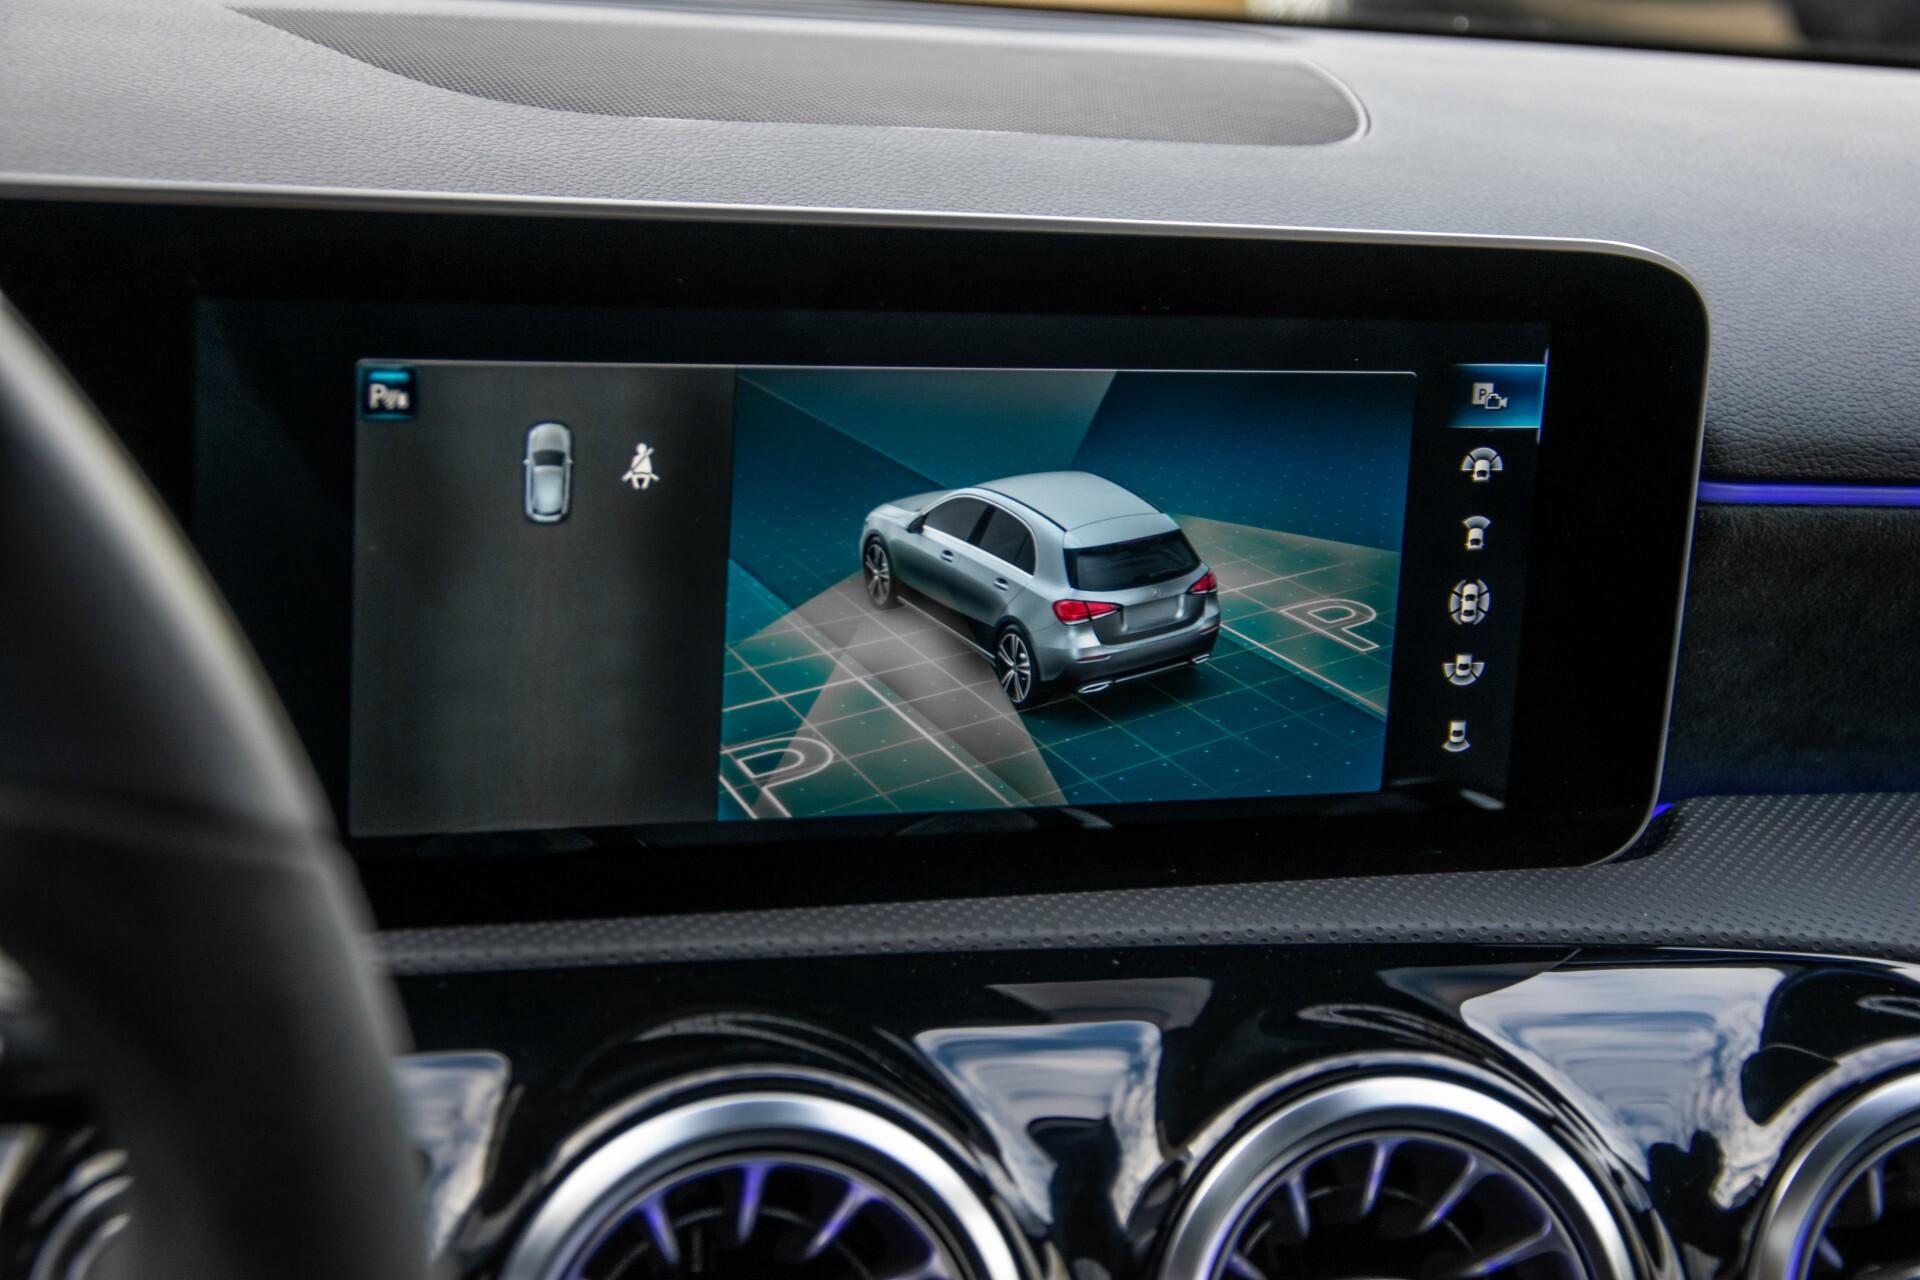 Mercedes-Benz A-Klasse 250 4-M AMG Panorama/Keyless-Entry/MBUX/HUD/Burmester/360/Multibeam LED Aut7 Foto 25